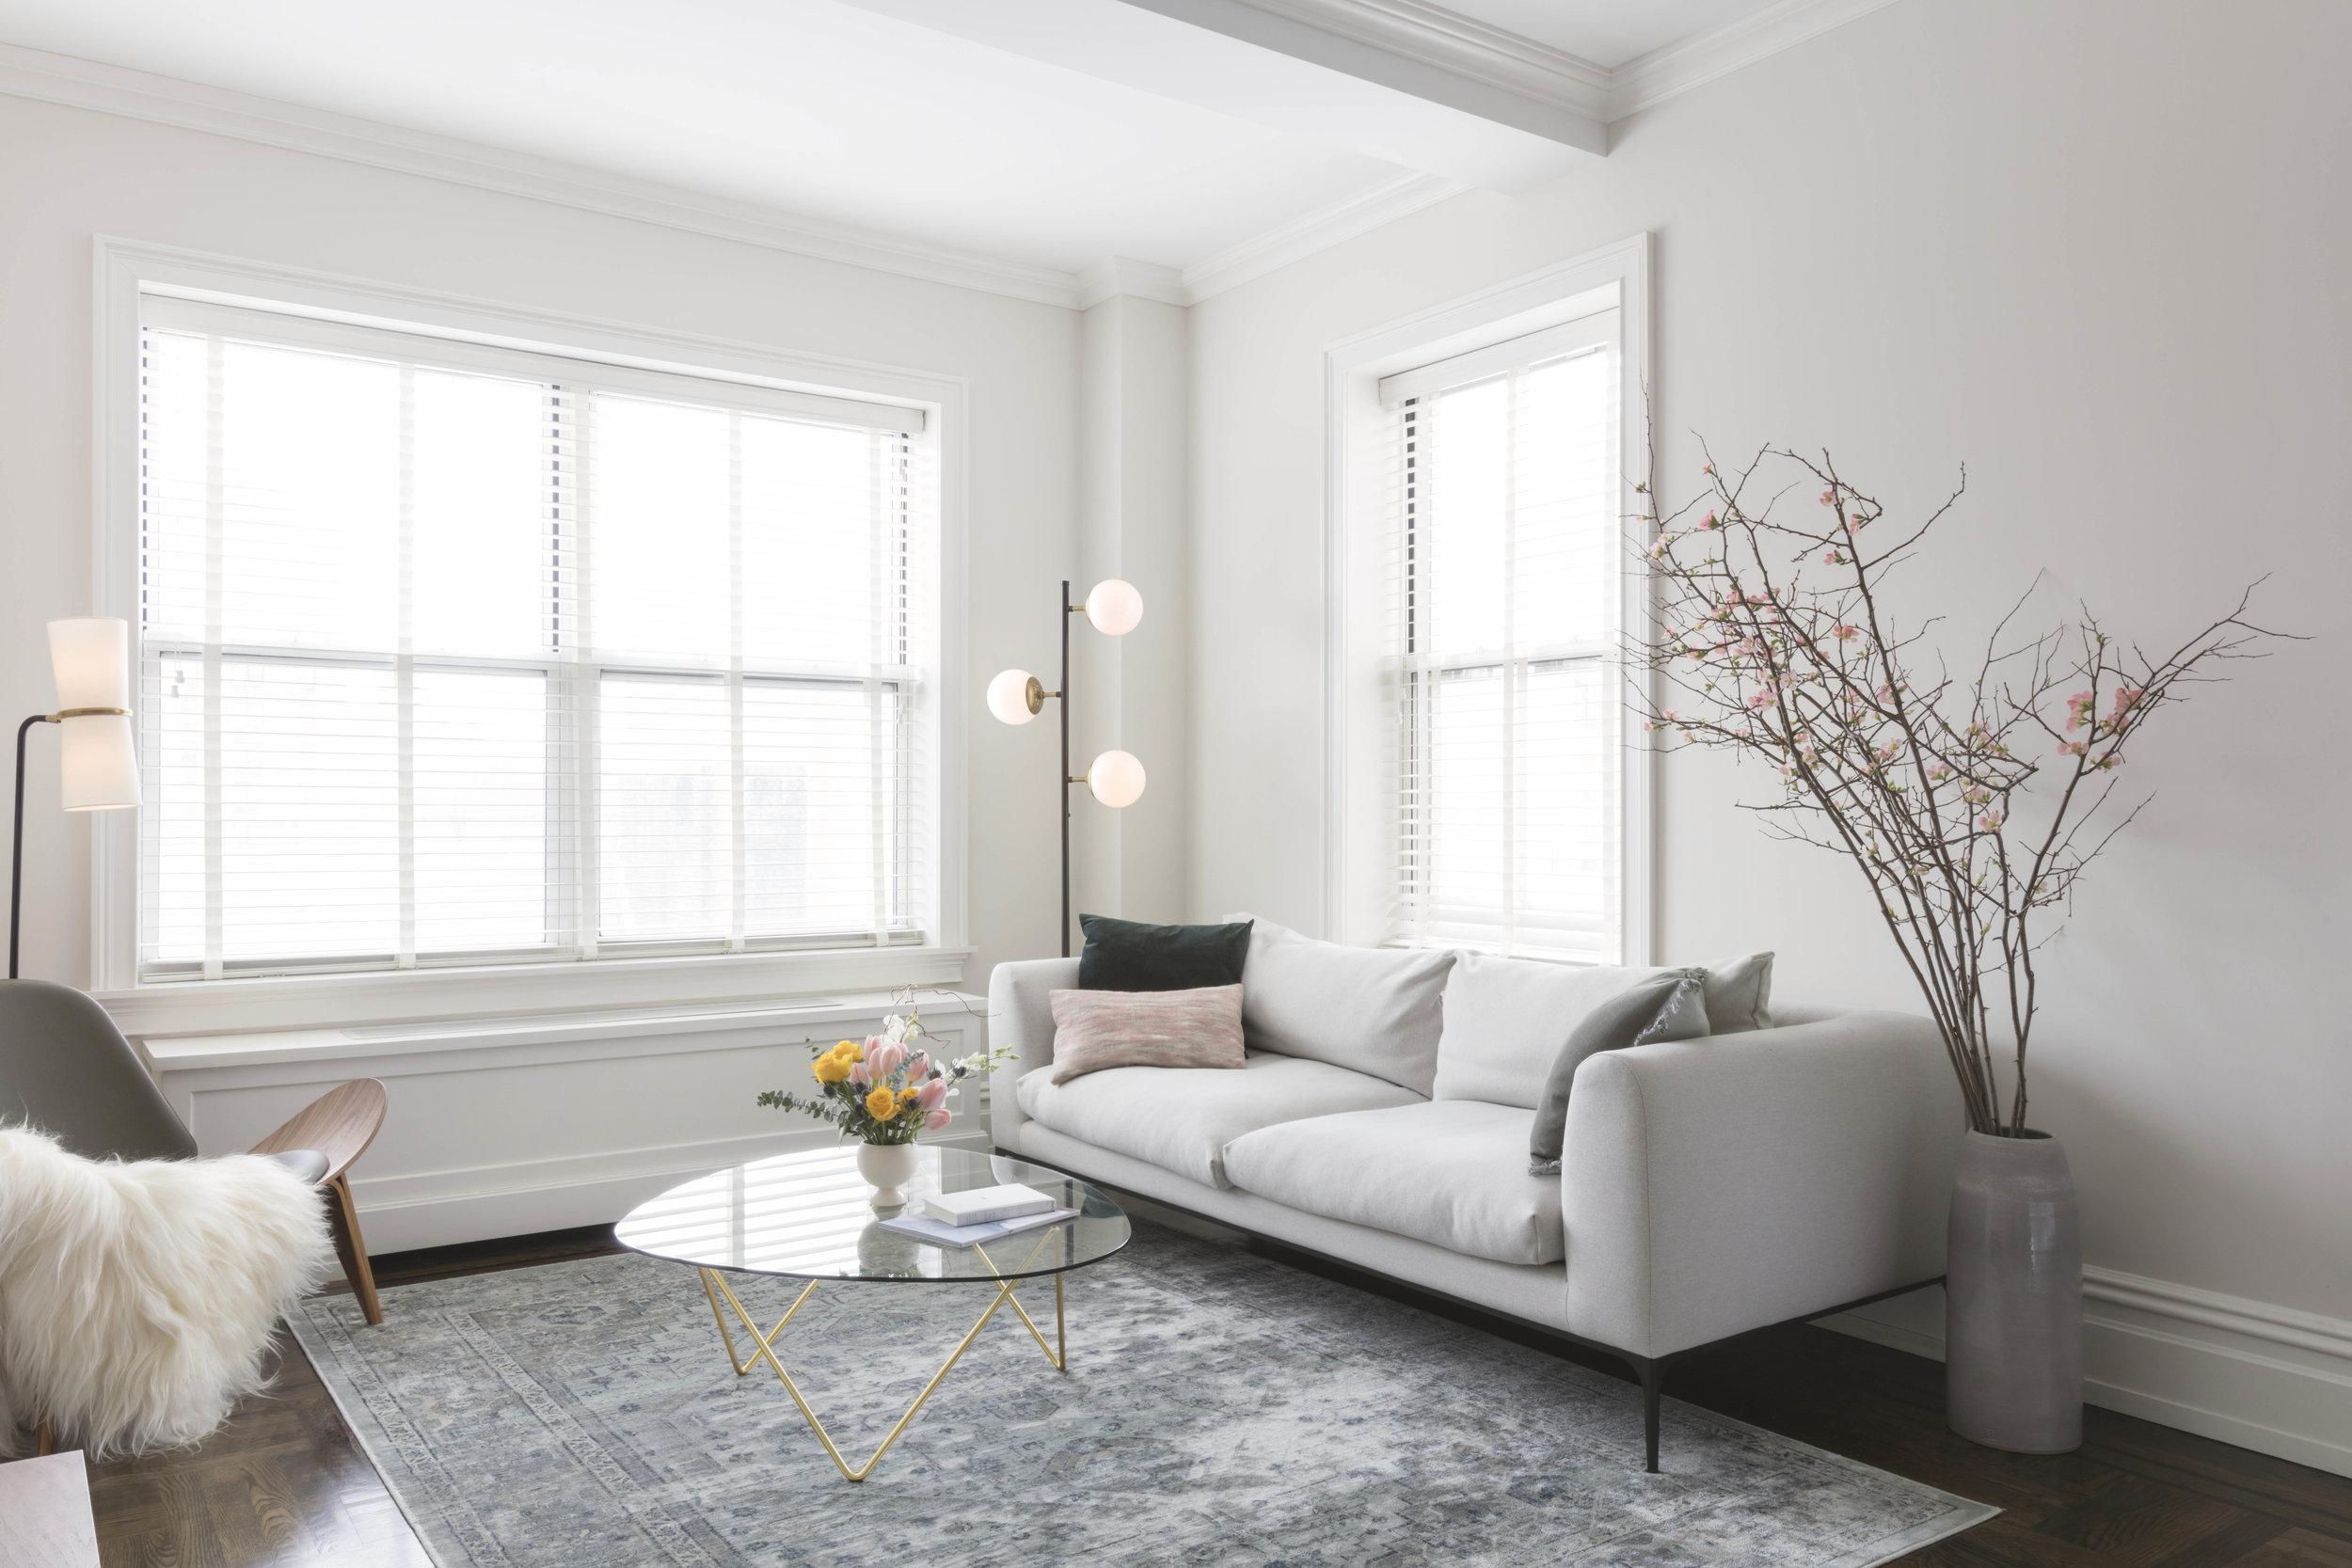 StudioJari_UWS_Livingroom_4.jpg